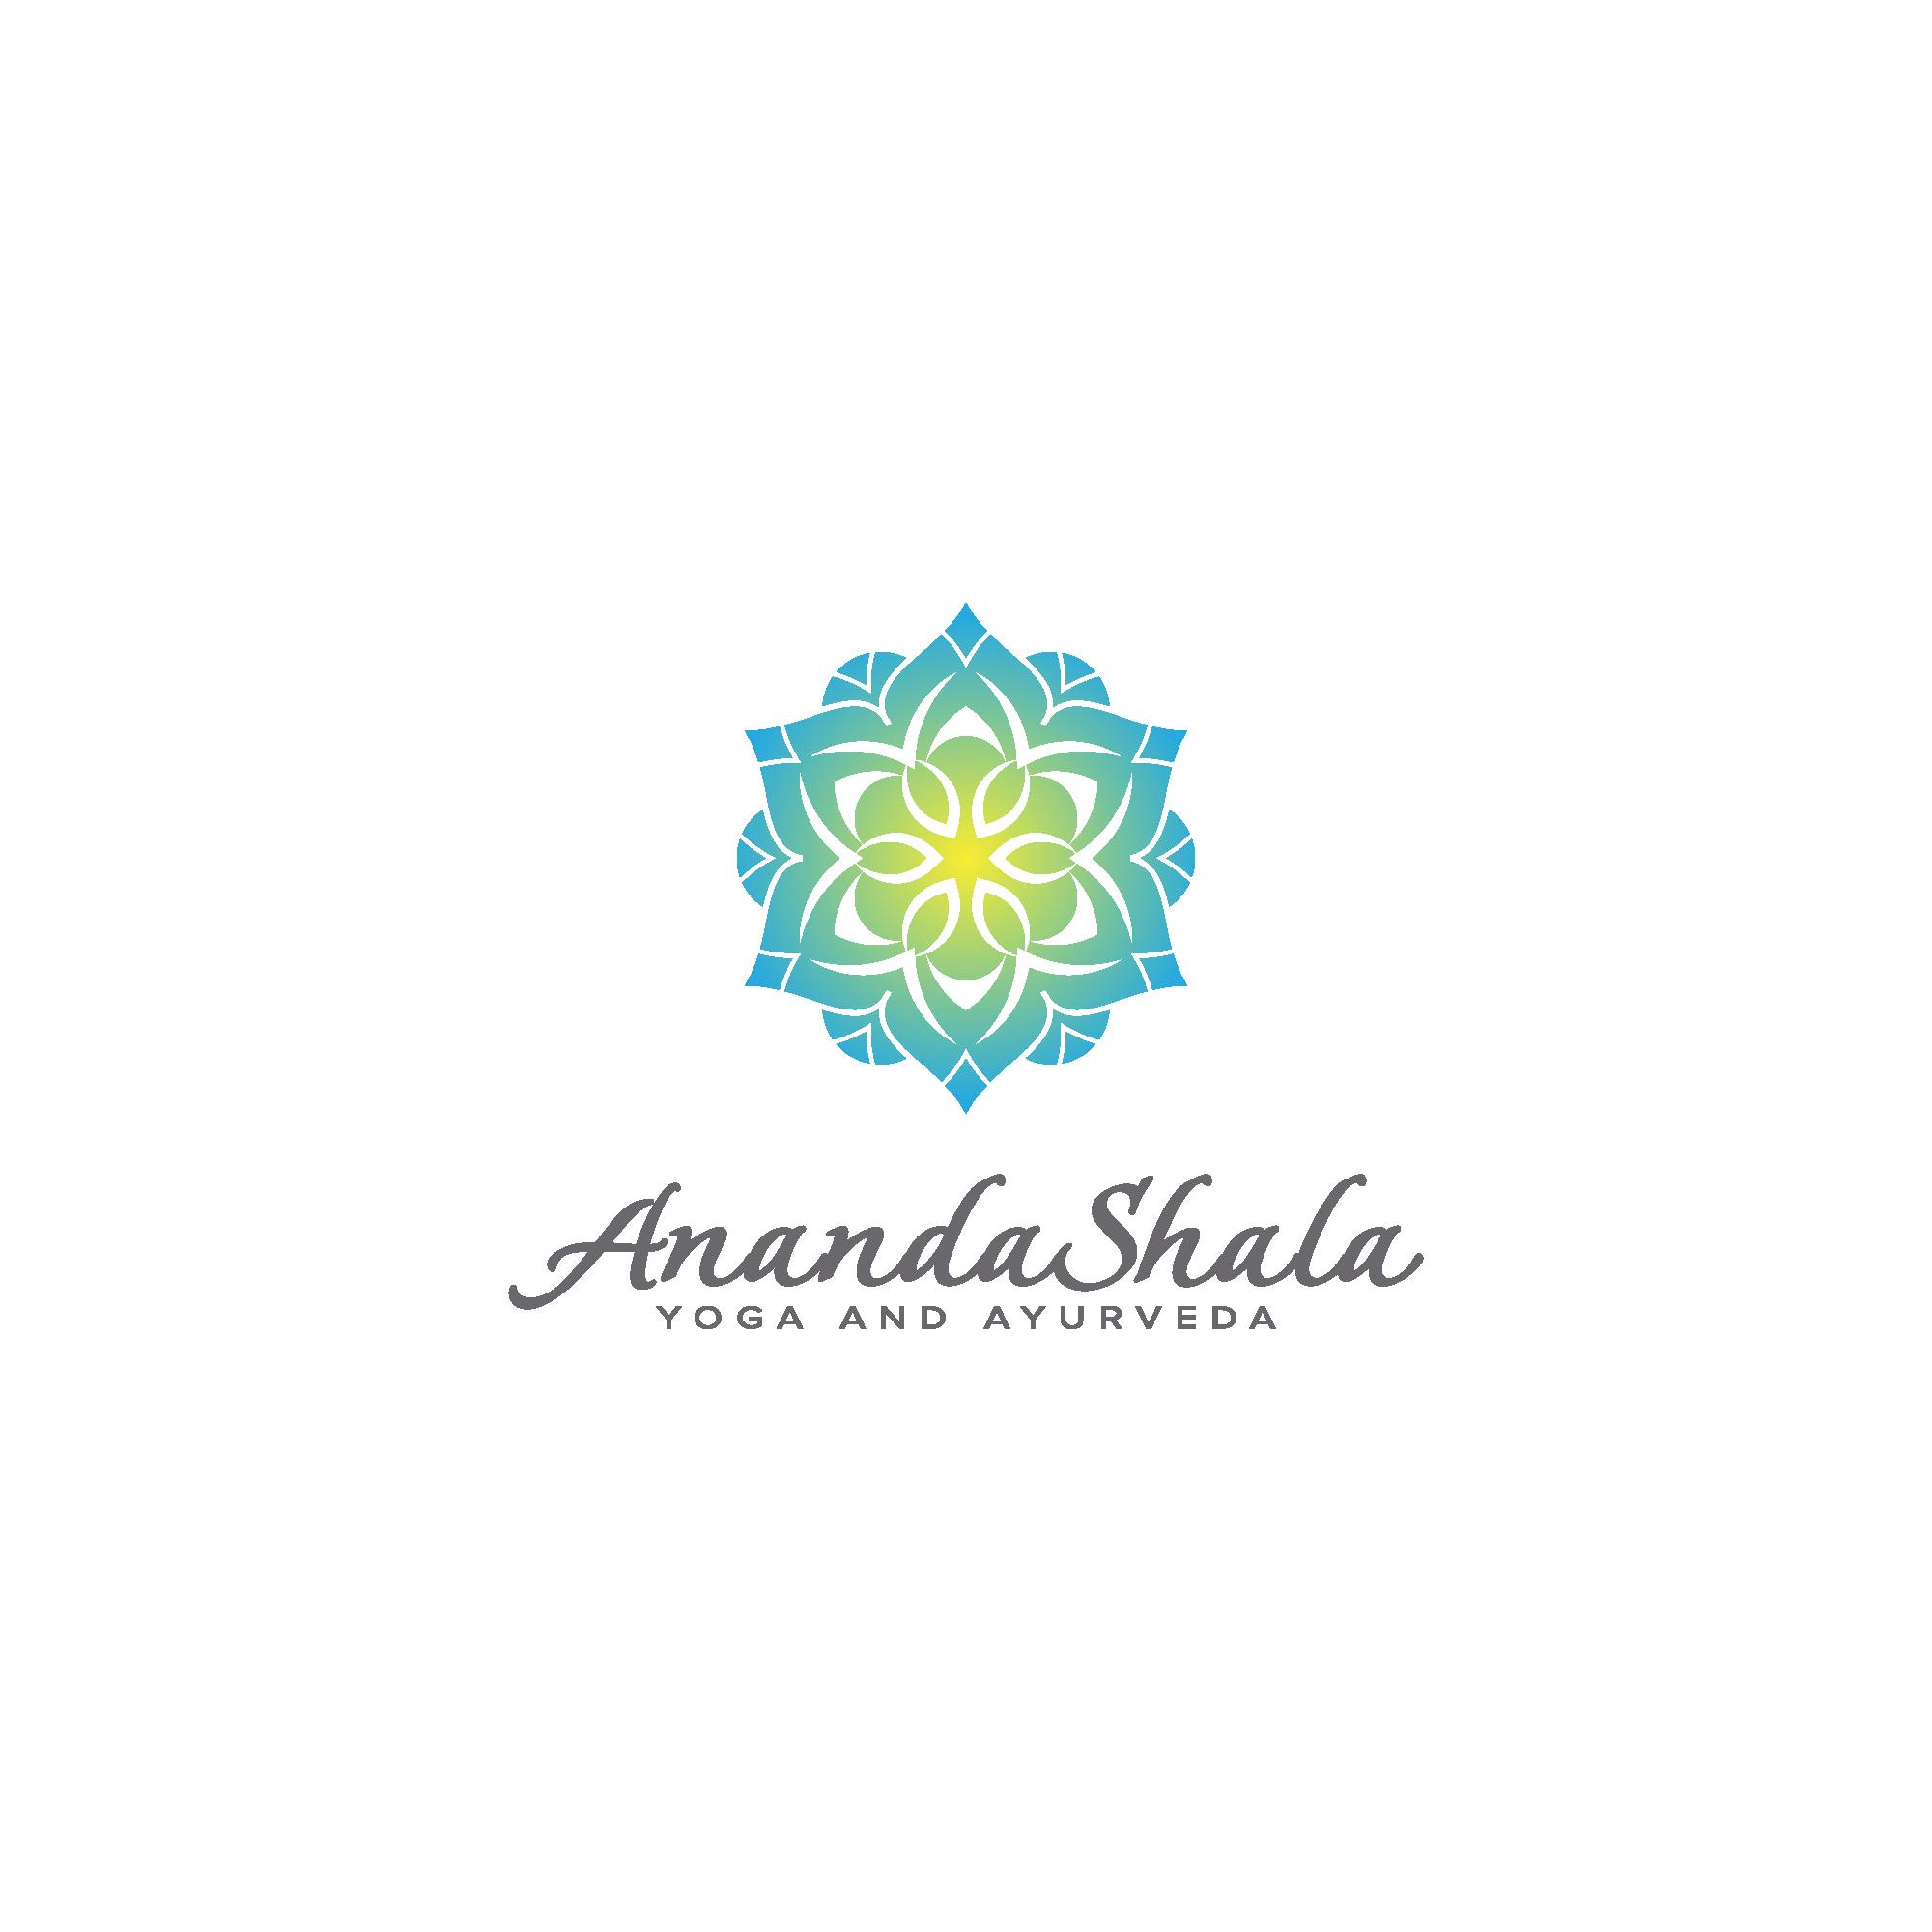 Yoga and Ayurveda Massage studio needs a fresh, eye-catching design